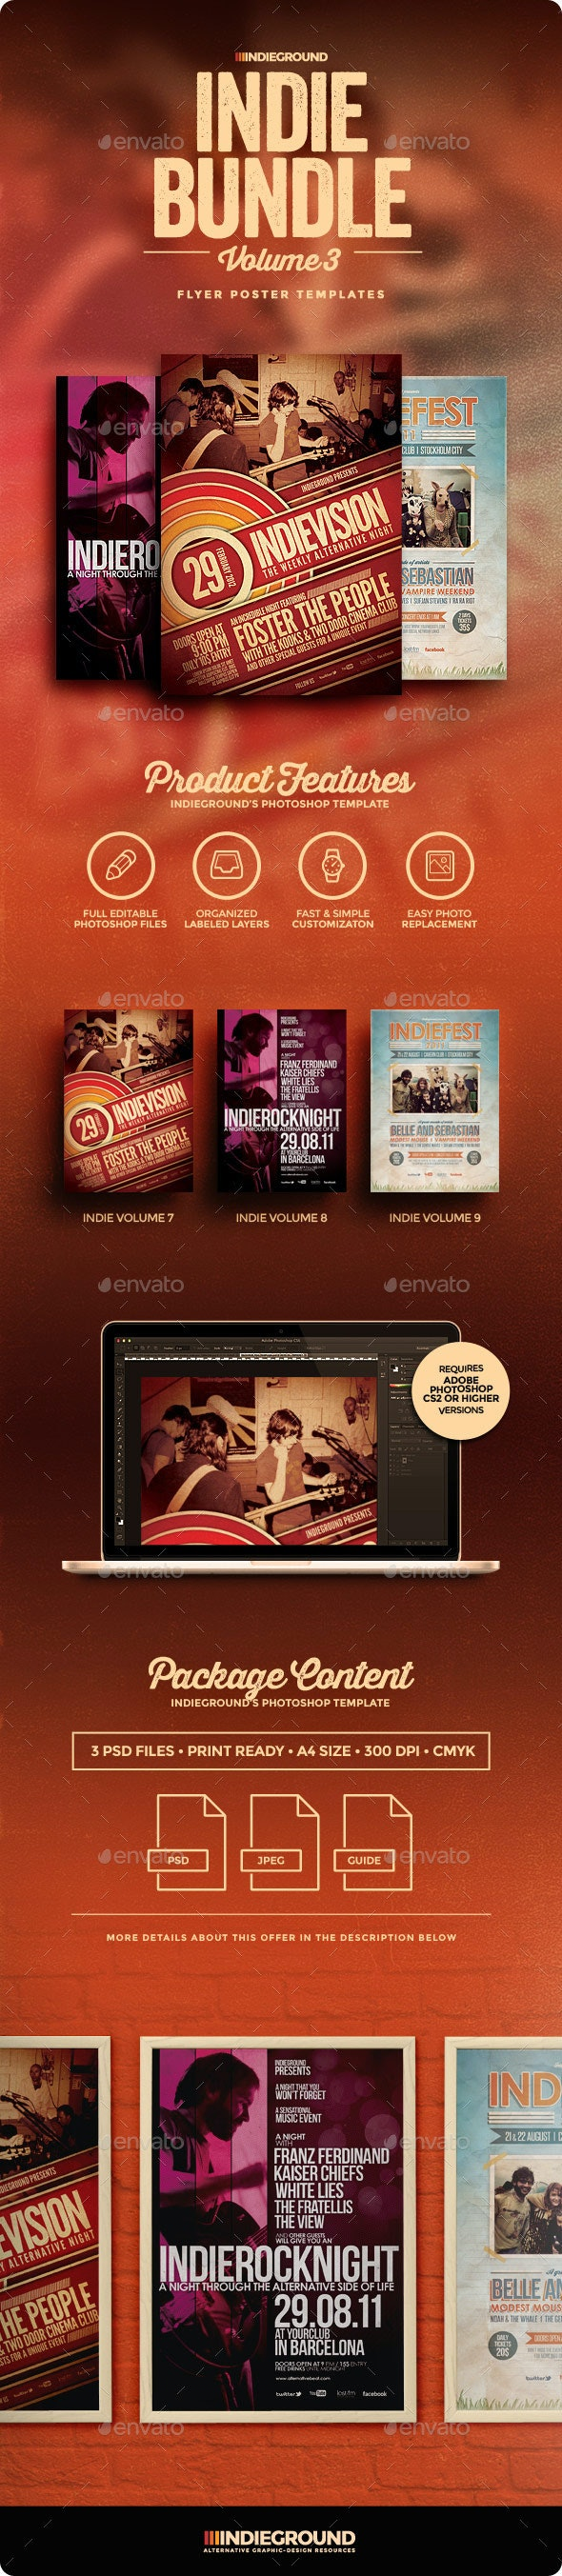 Indie Flyer/Poster Bundle Vol. 7-9 - Clubs & Parties Events